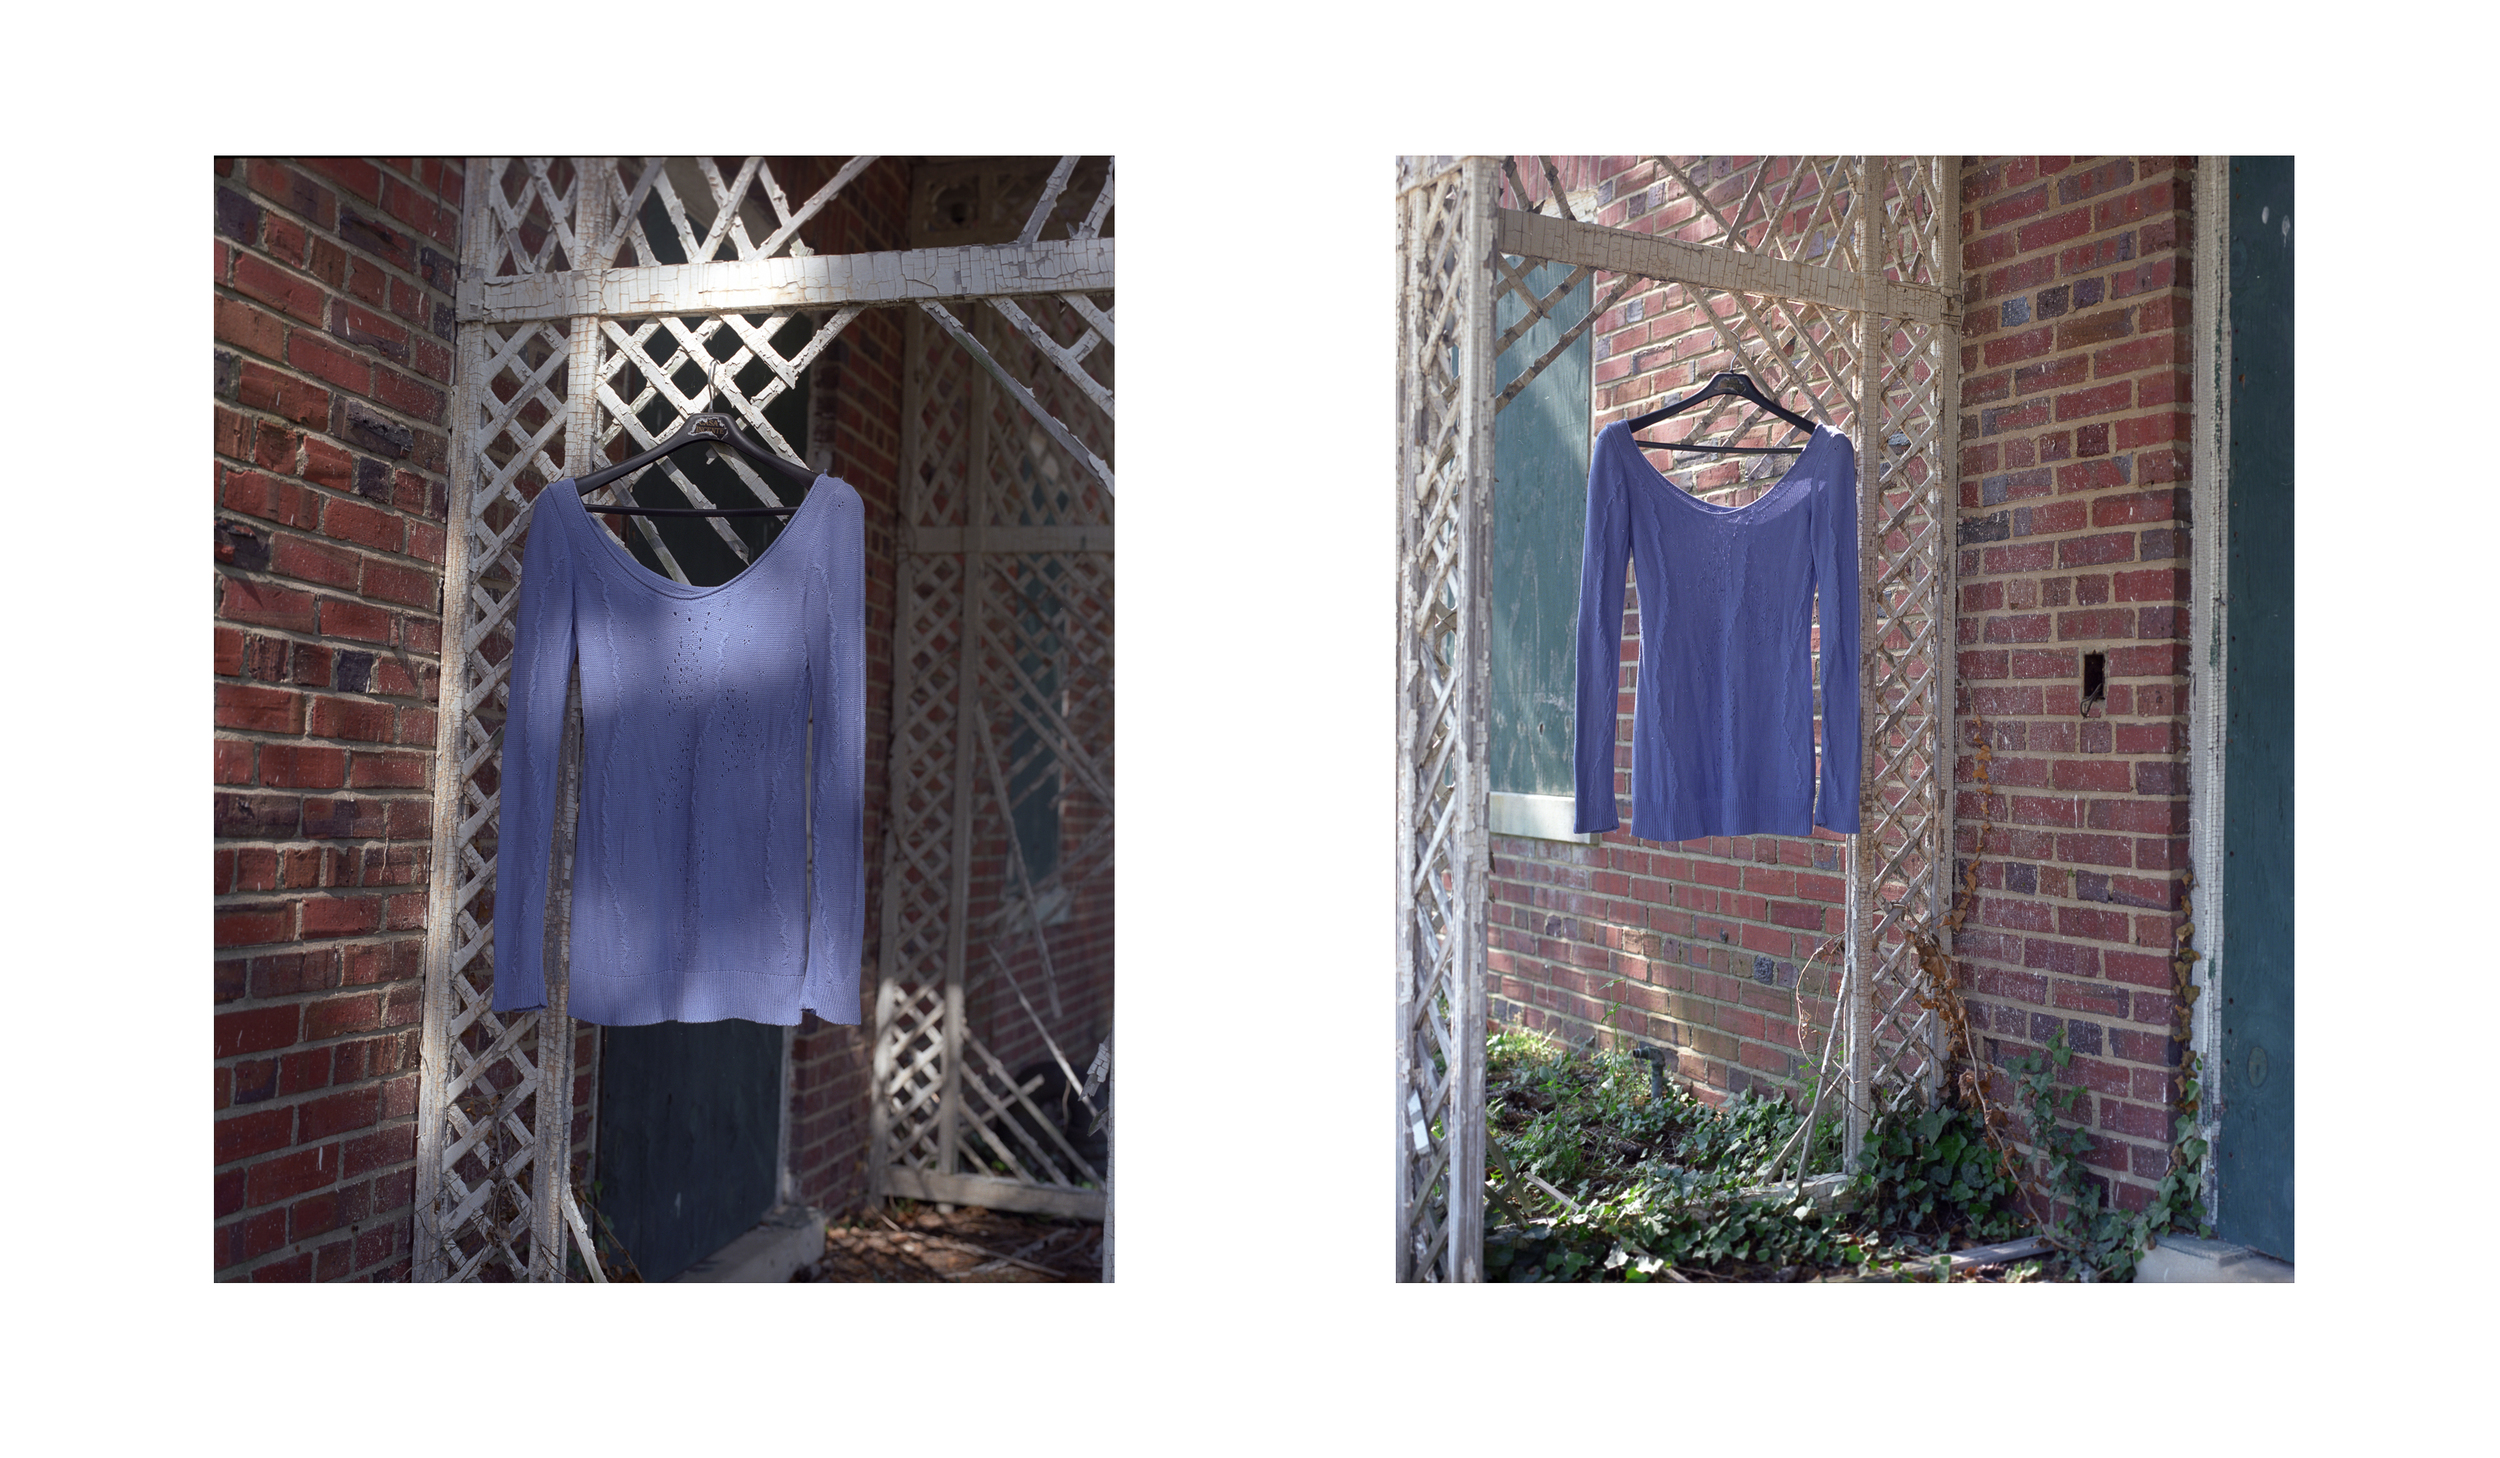 editorial-commercial-photography-long-island-ny-product-photographer-clothing-shirt-kppc-film-kodak-mamiya-2.jpg